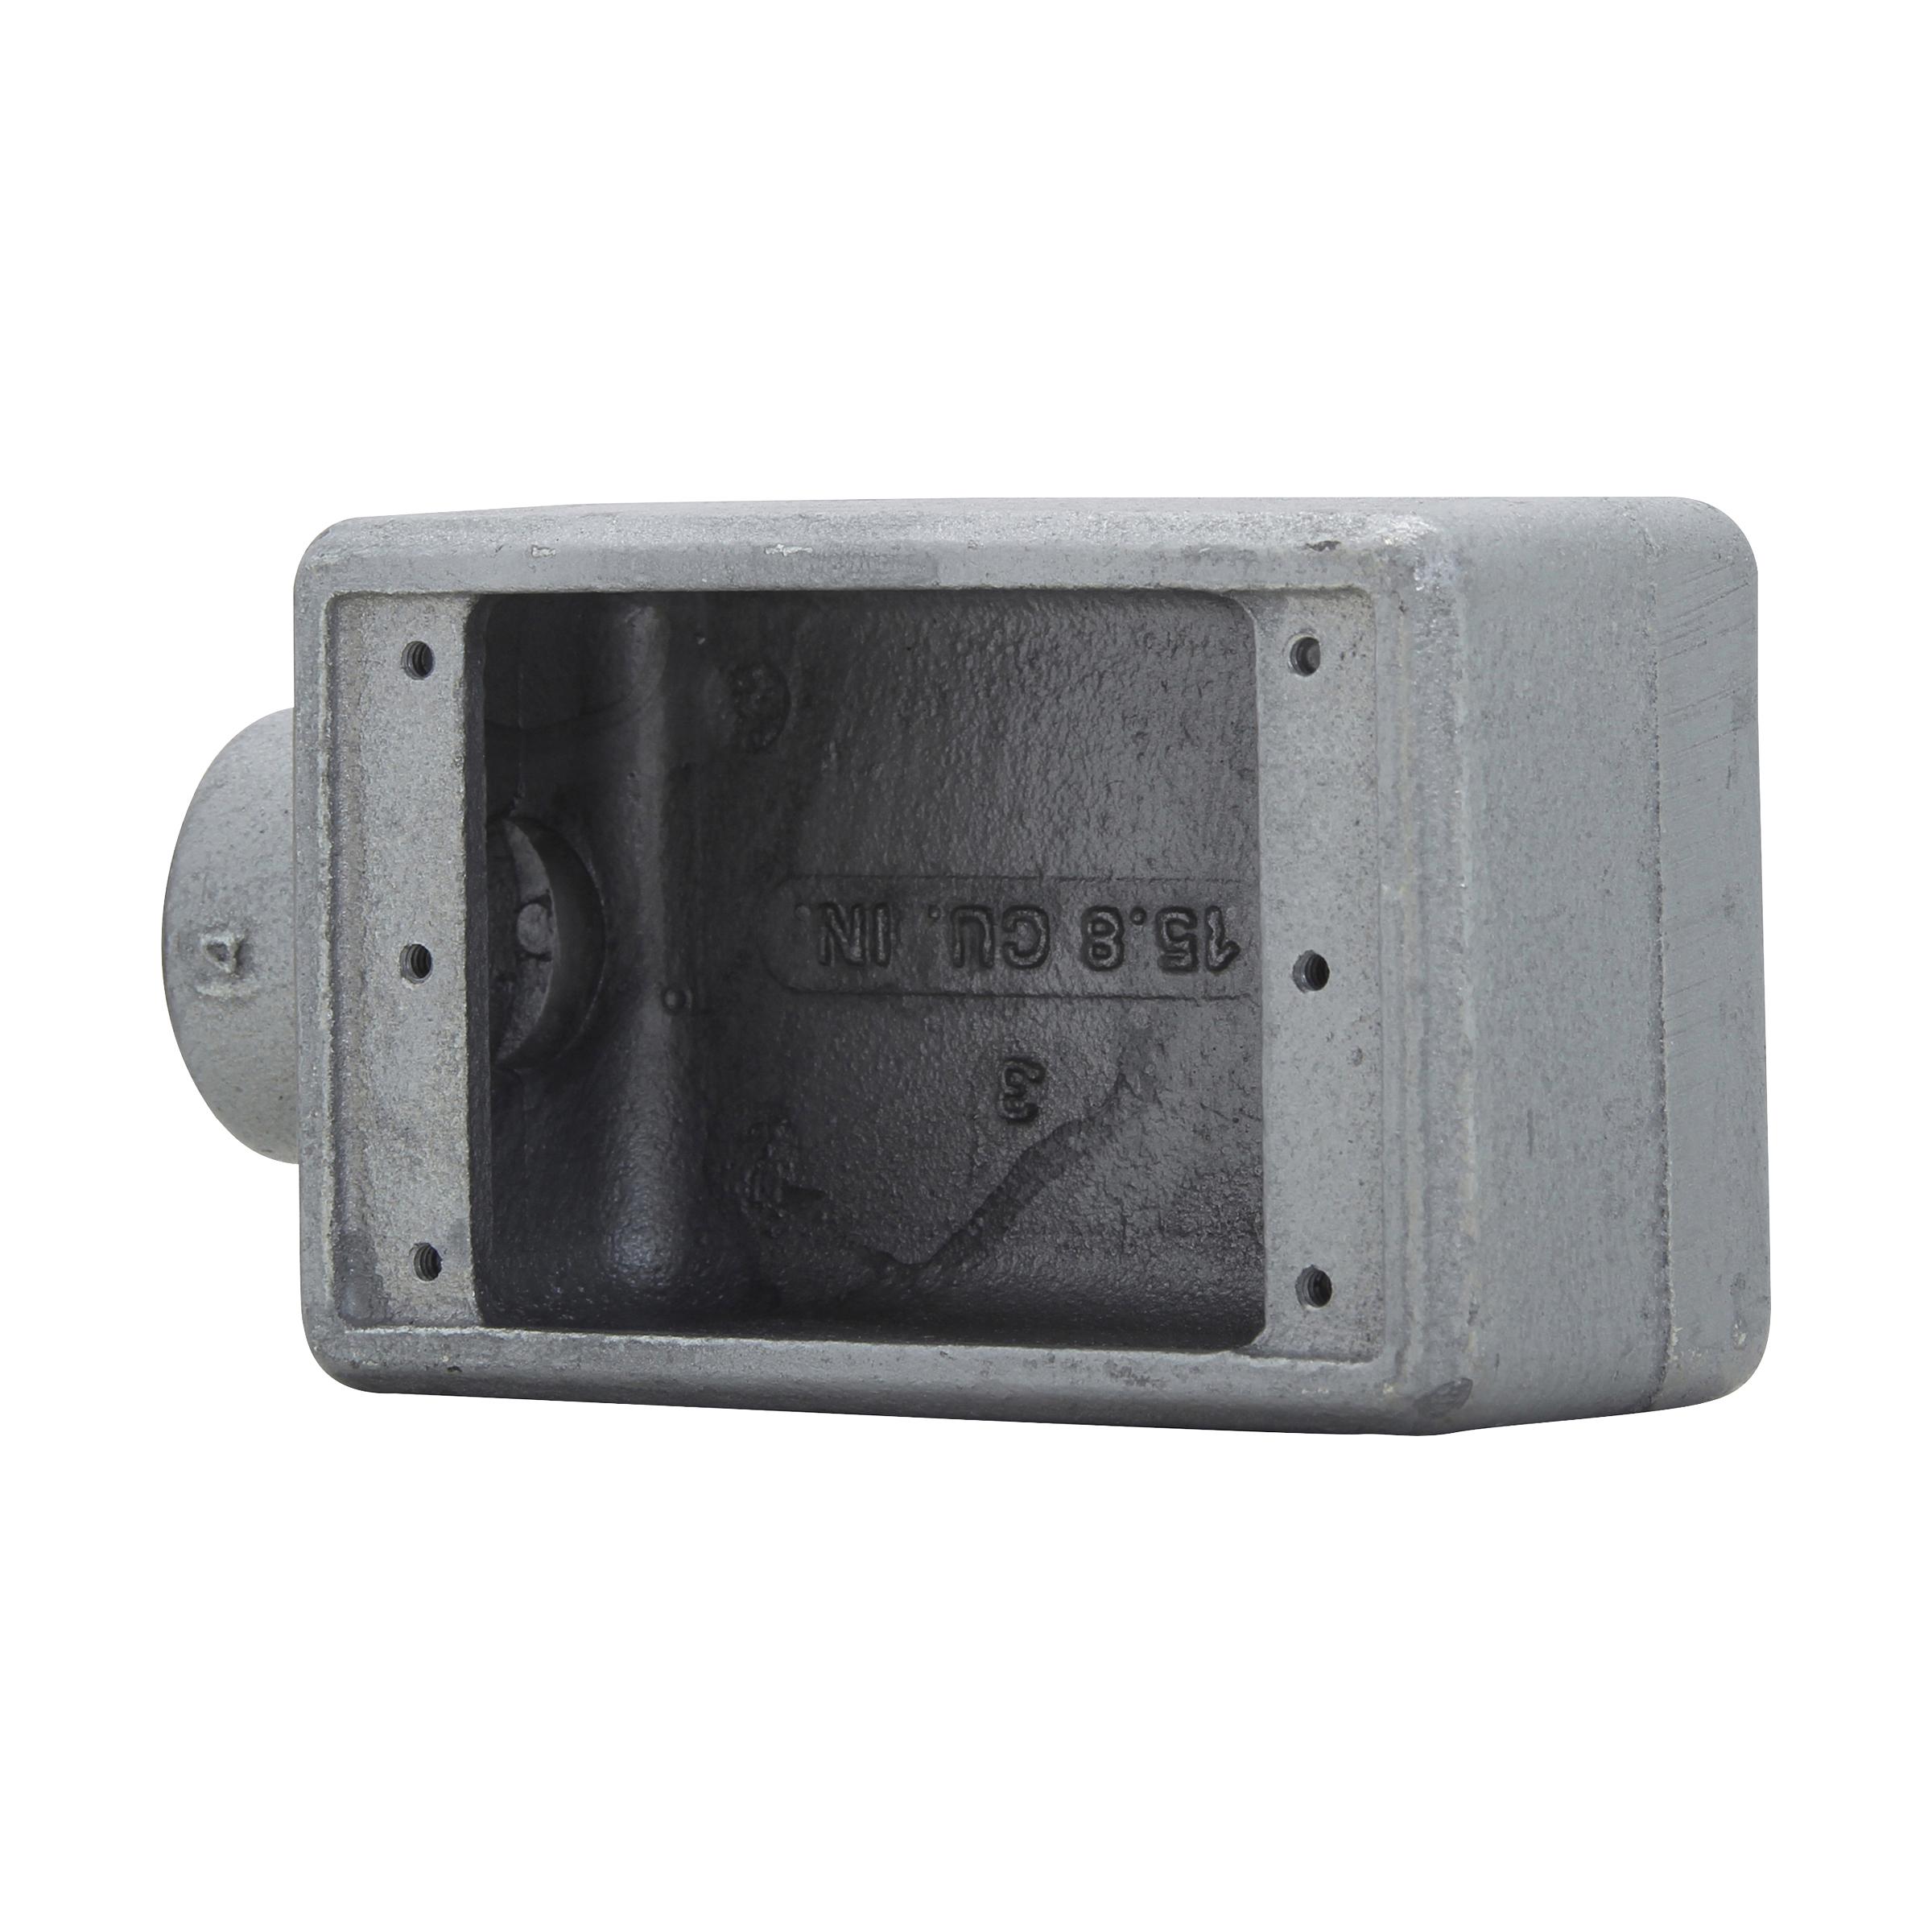 CRSH FS2 FS-DEV BOX